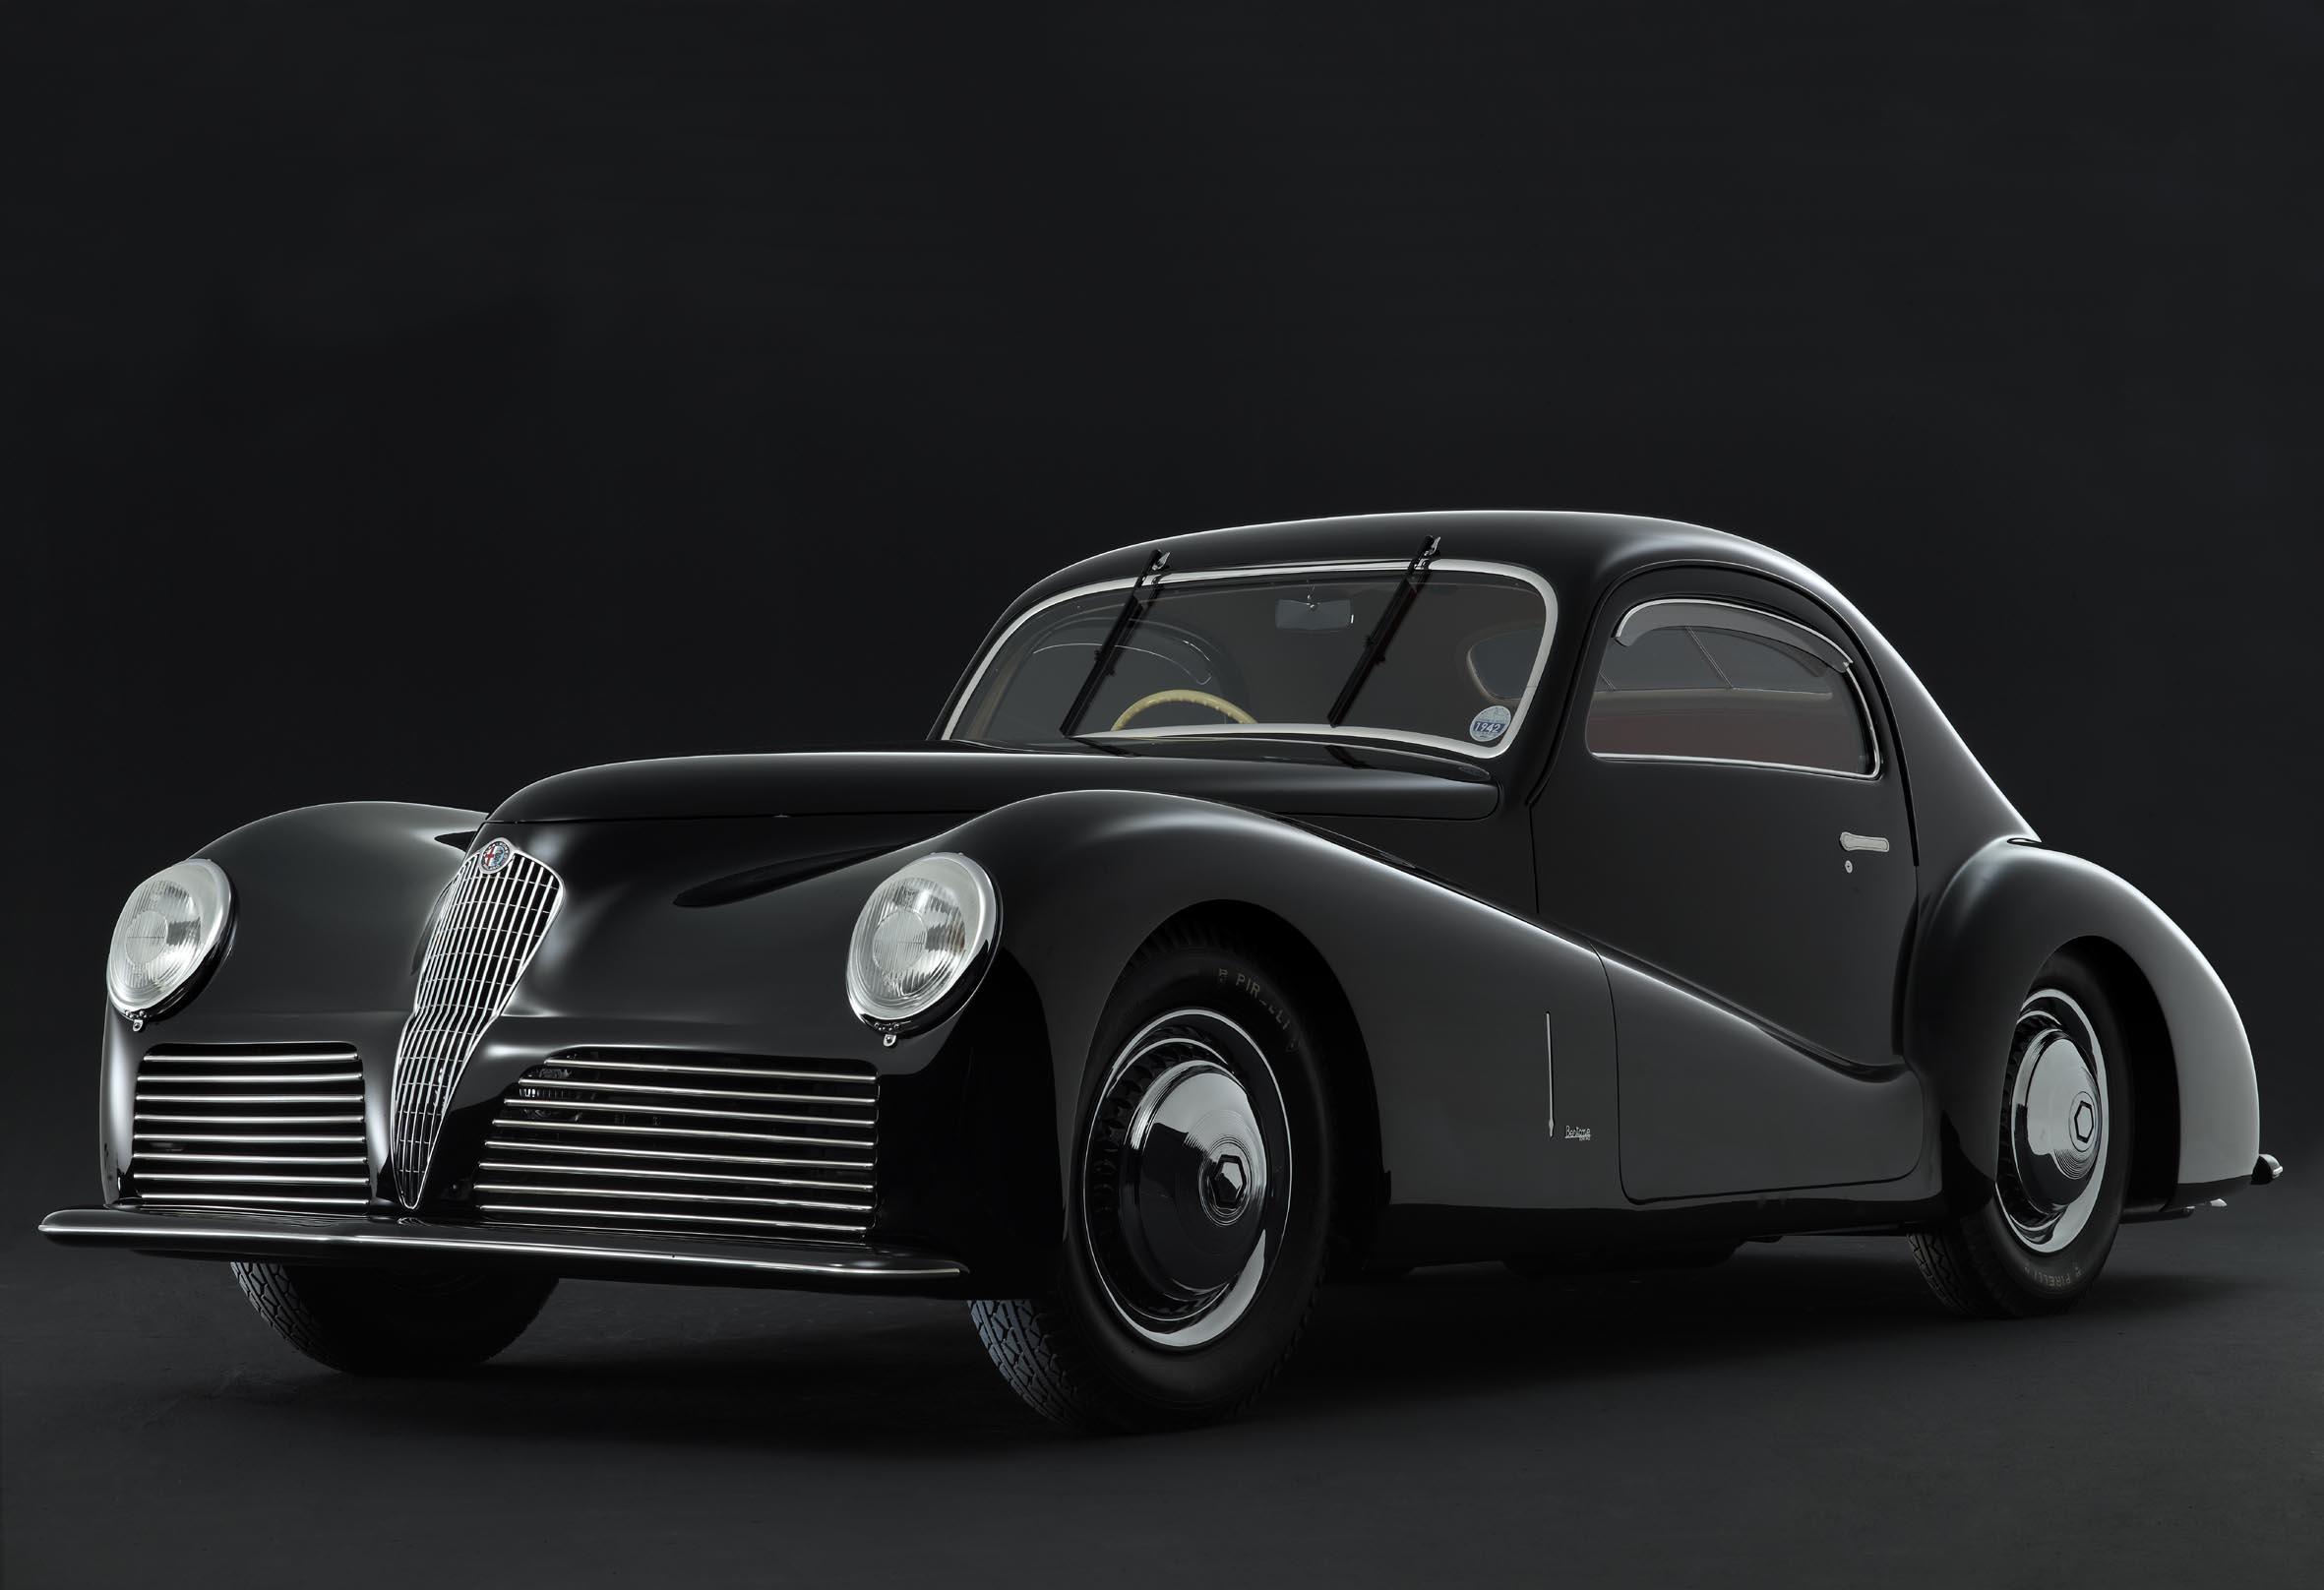 Alfa Romeo 6C 2500 SS +ö+ç+¦ car. Bertone +ö+ç+¦ 1942 - 02 - foto Roberto Carrer